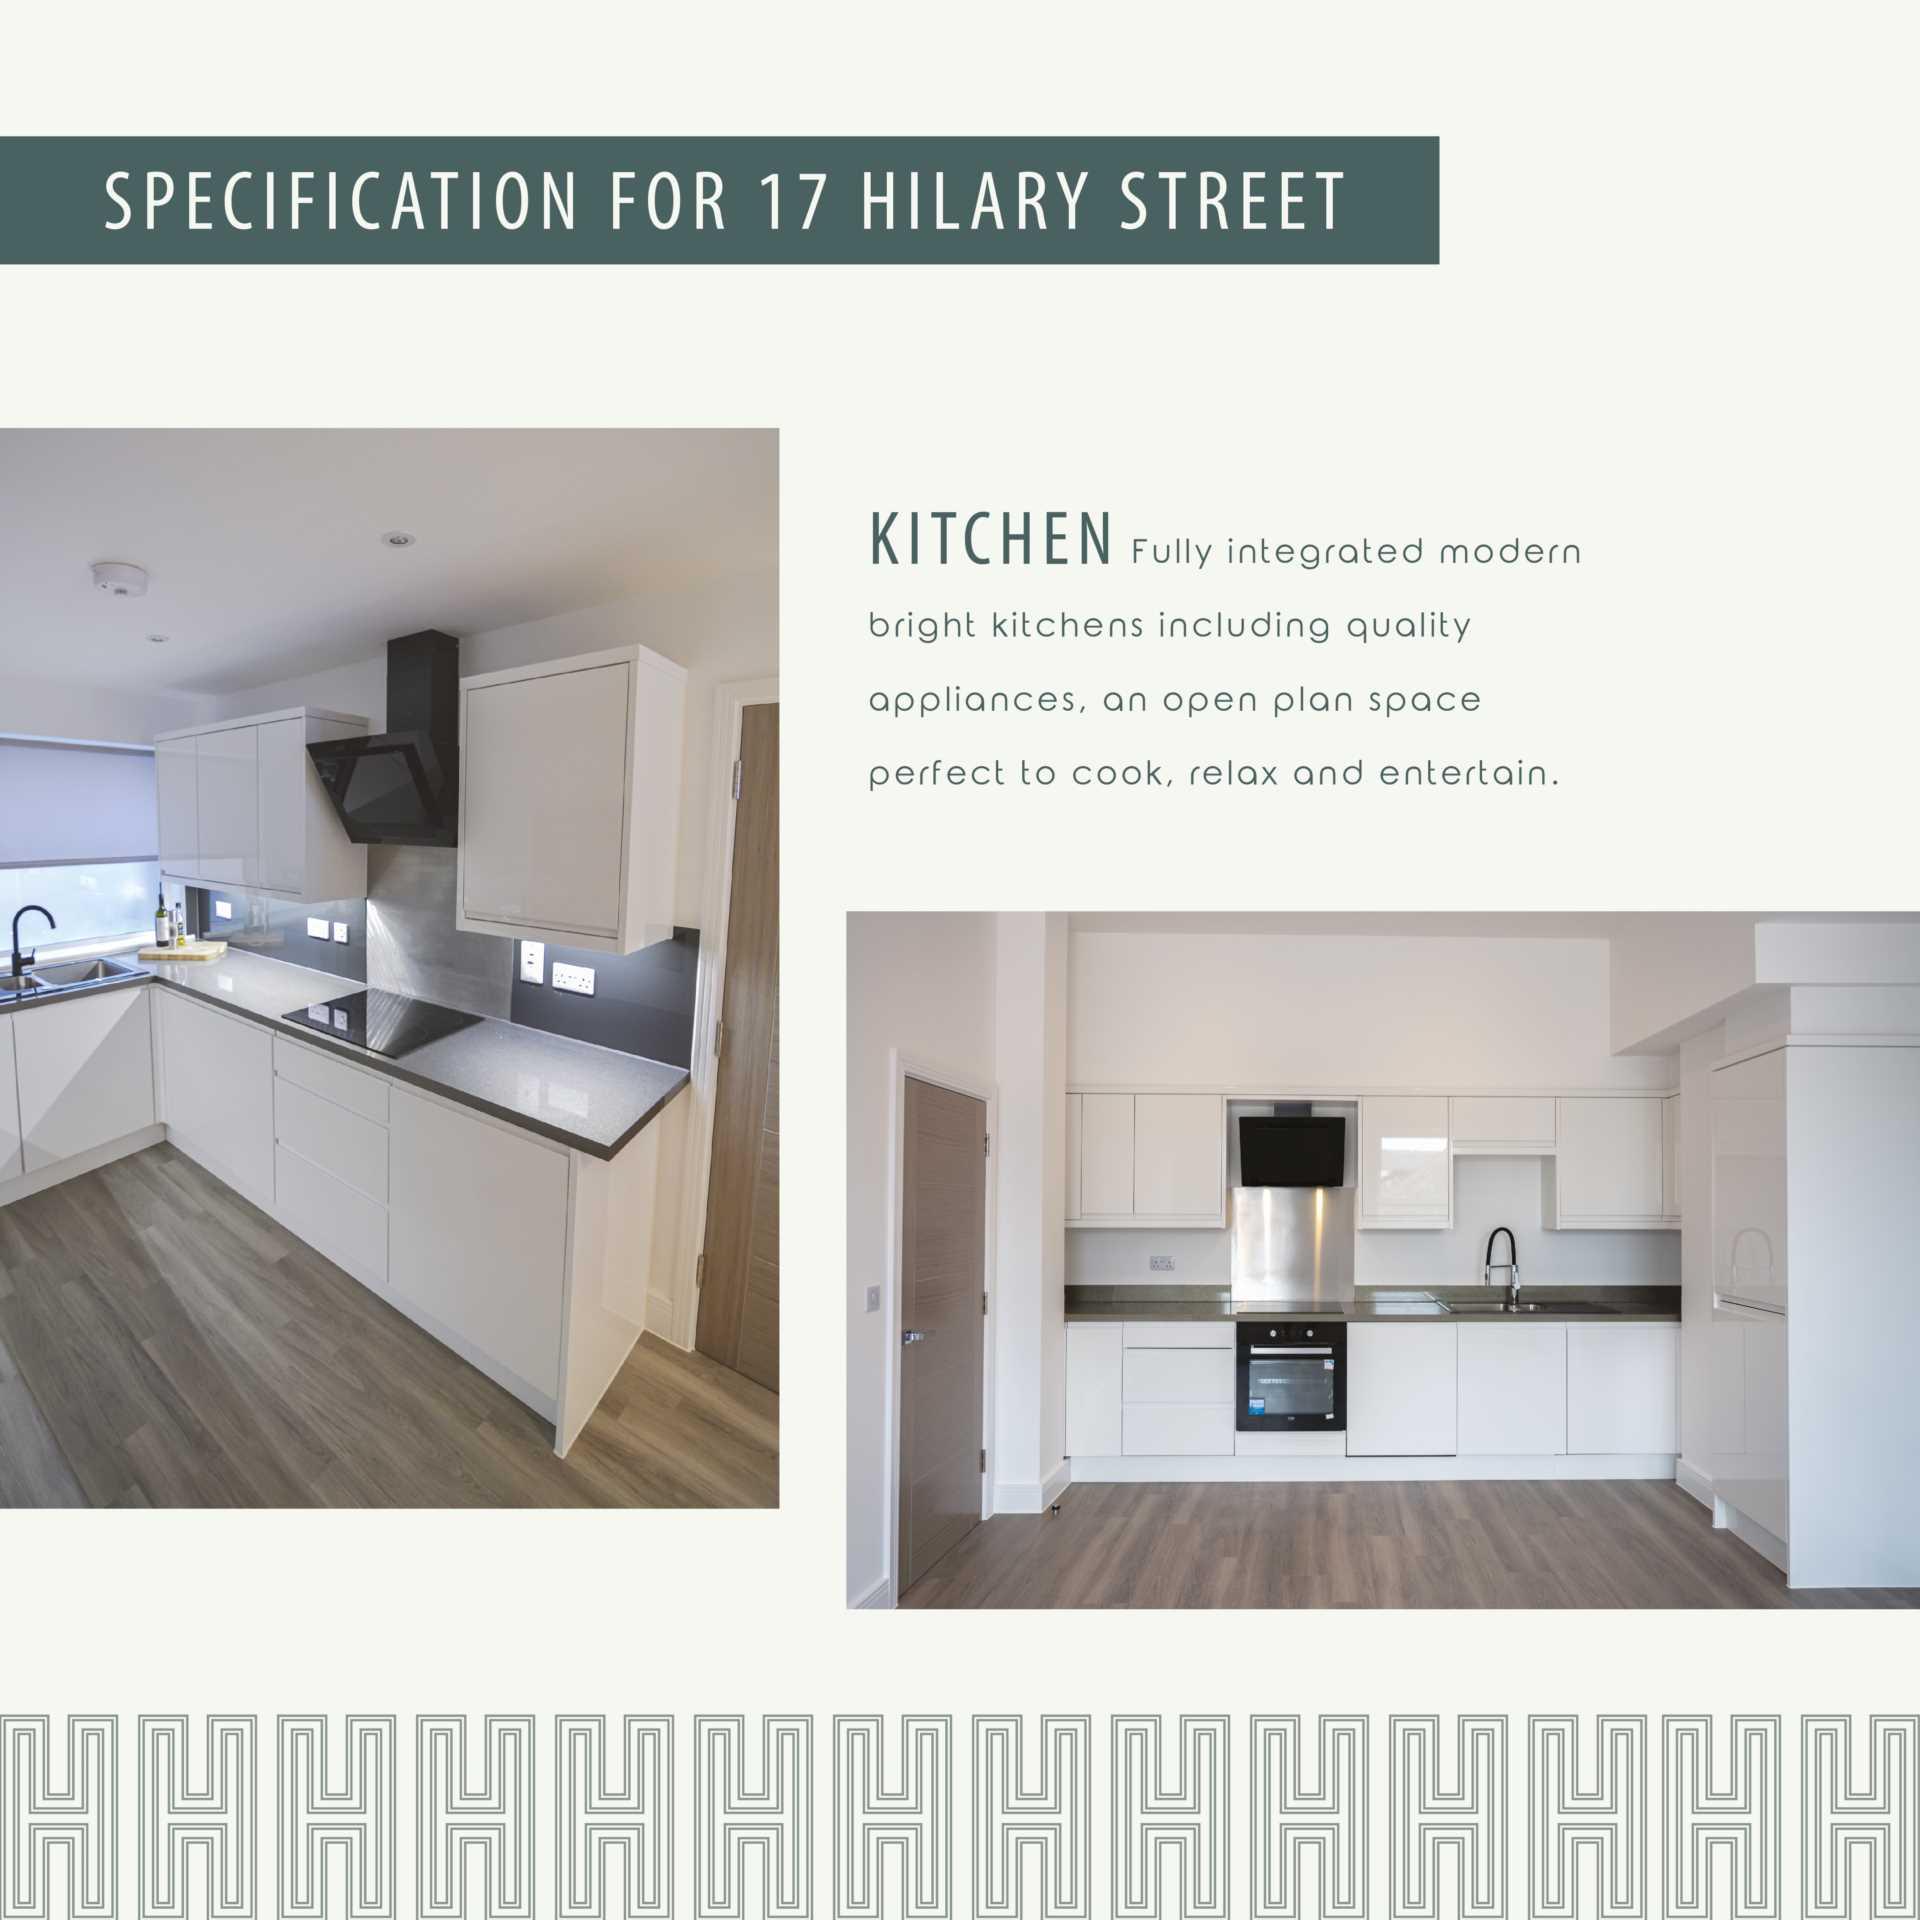 Flat 5, 17 Hilary Street, Image 4